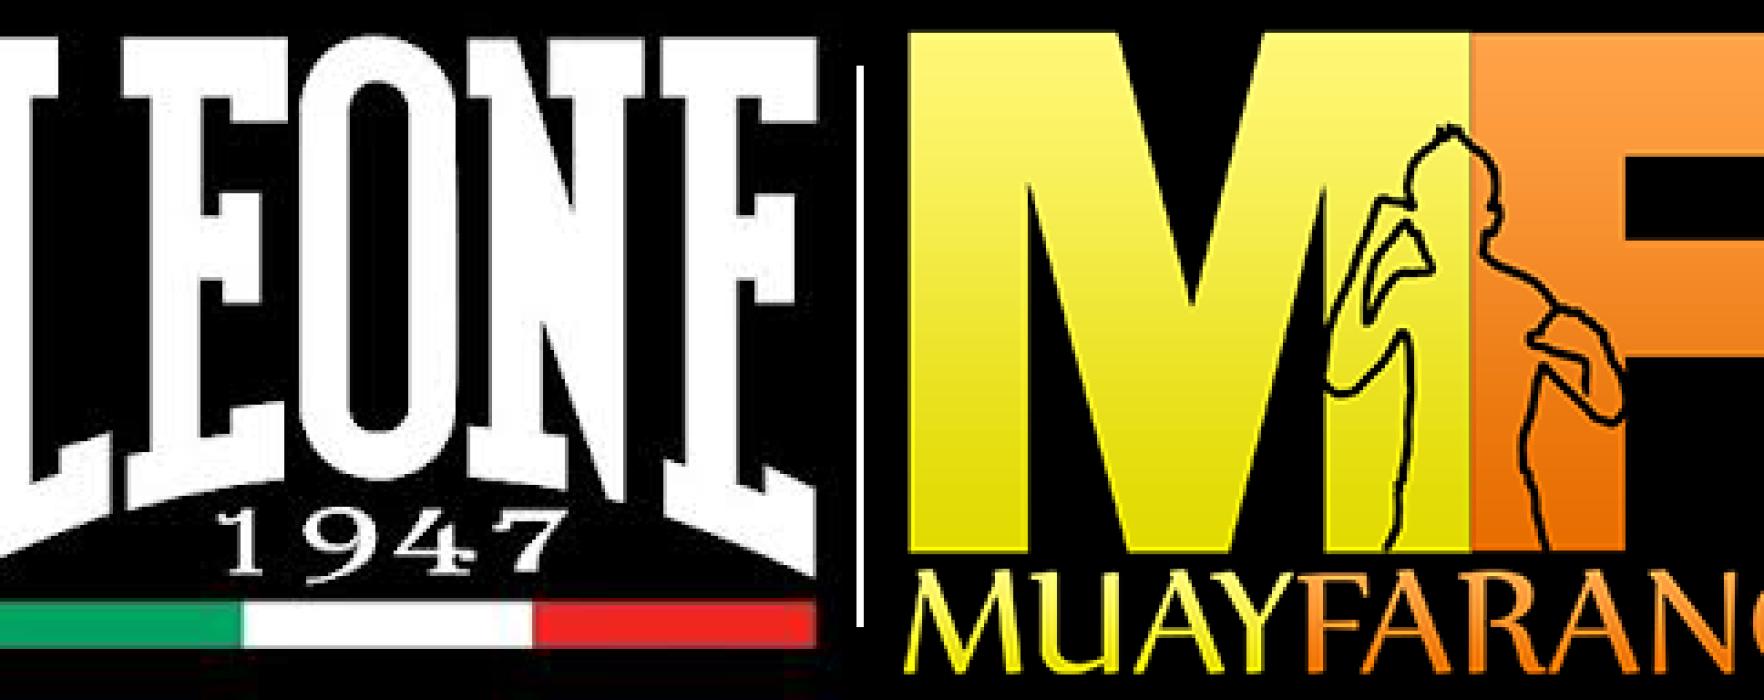 Muay Farang sponsored by Leone 1947